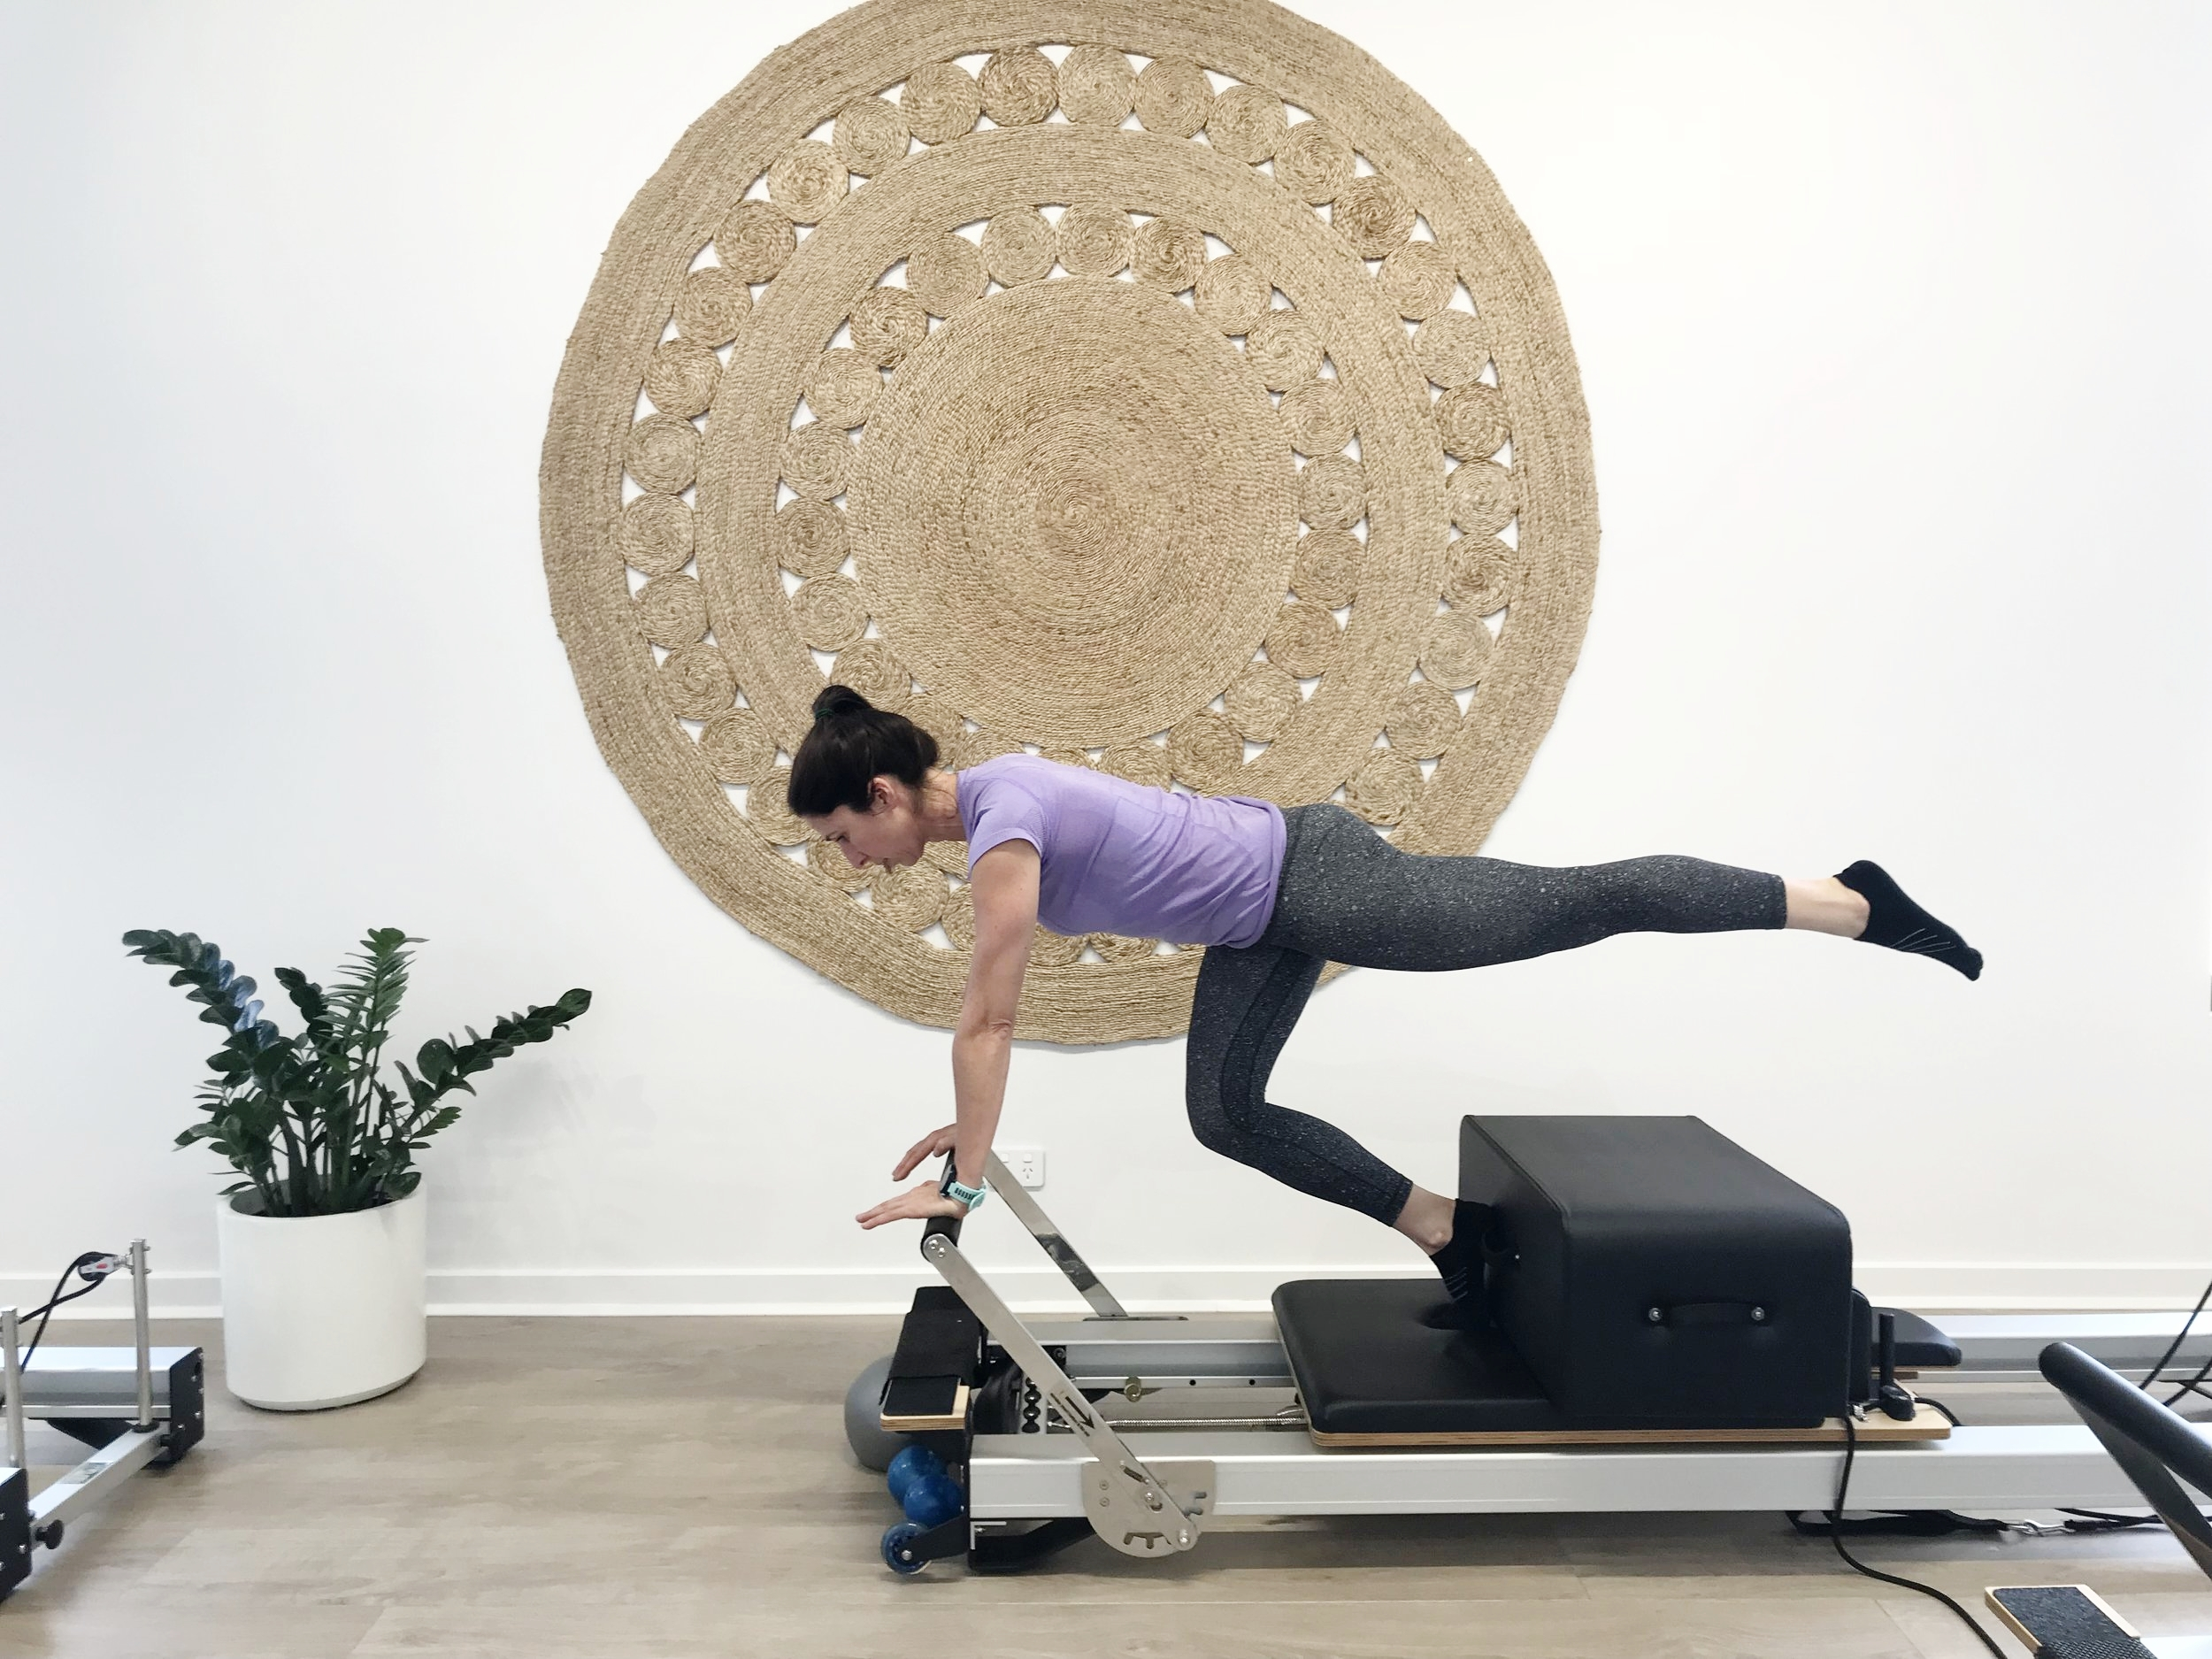 Pilates classes, Mansfield, Victoria at Barefoot Studio